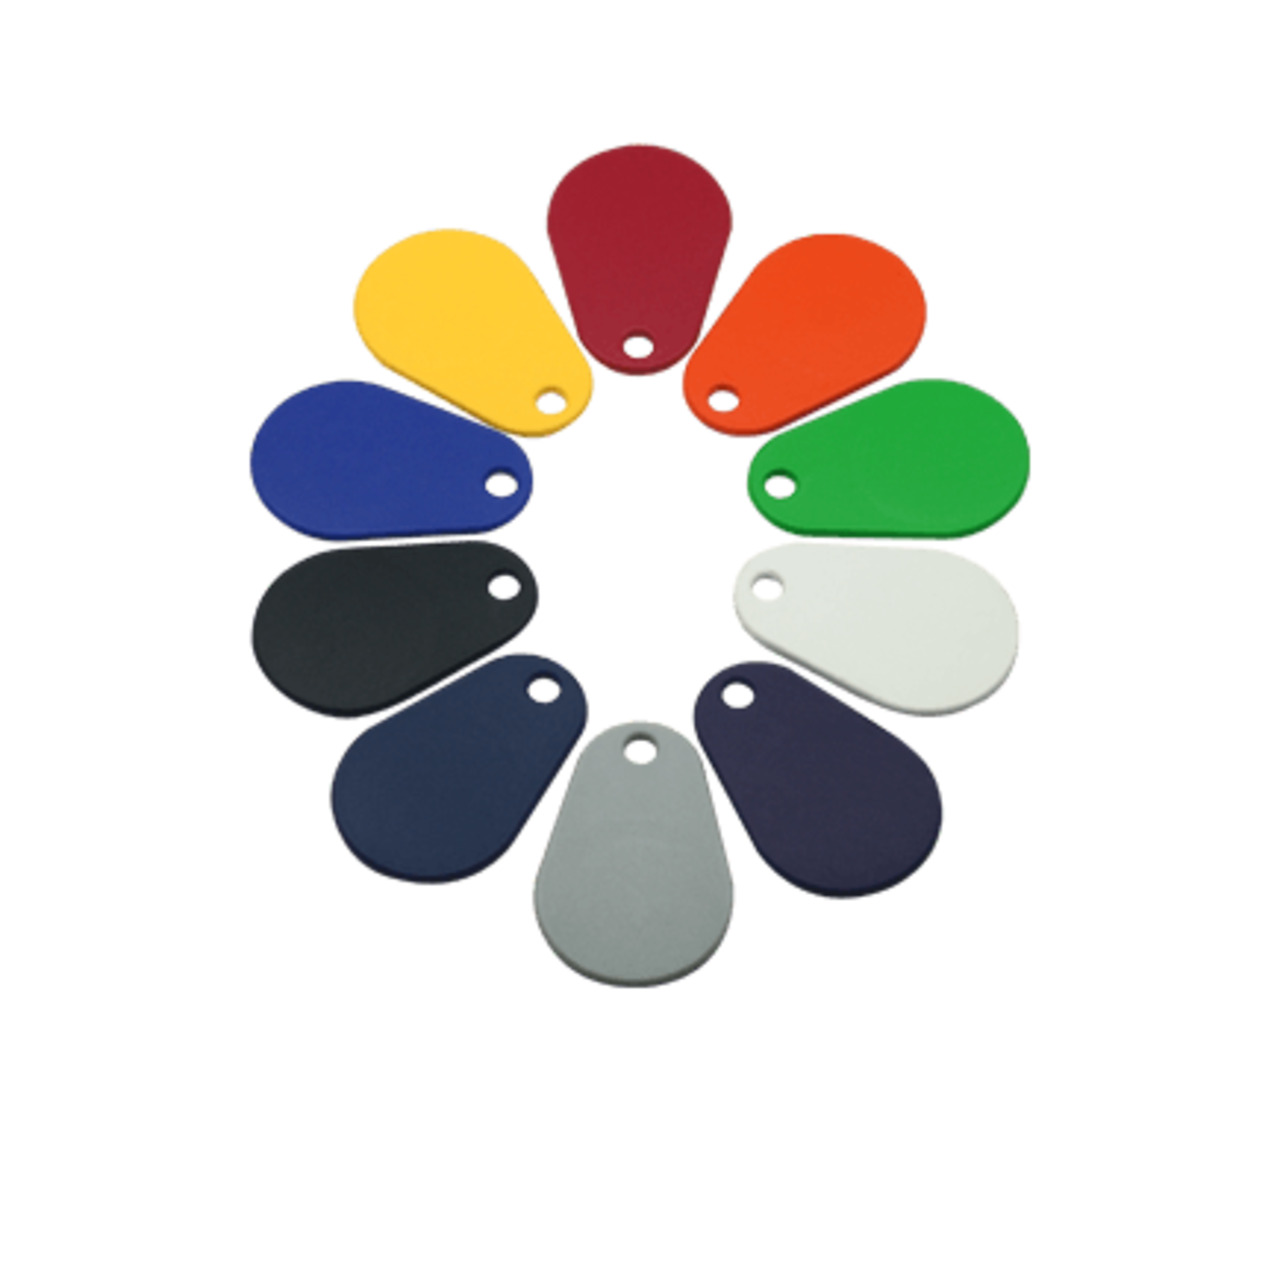 NFC Key Fob Sample Pack